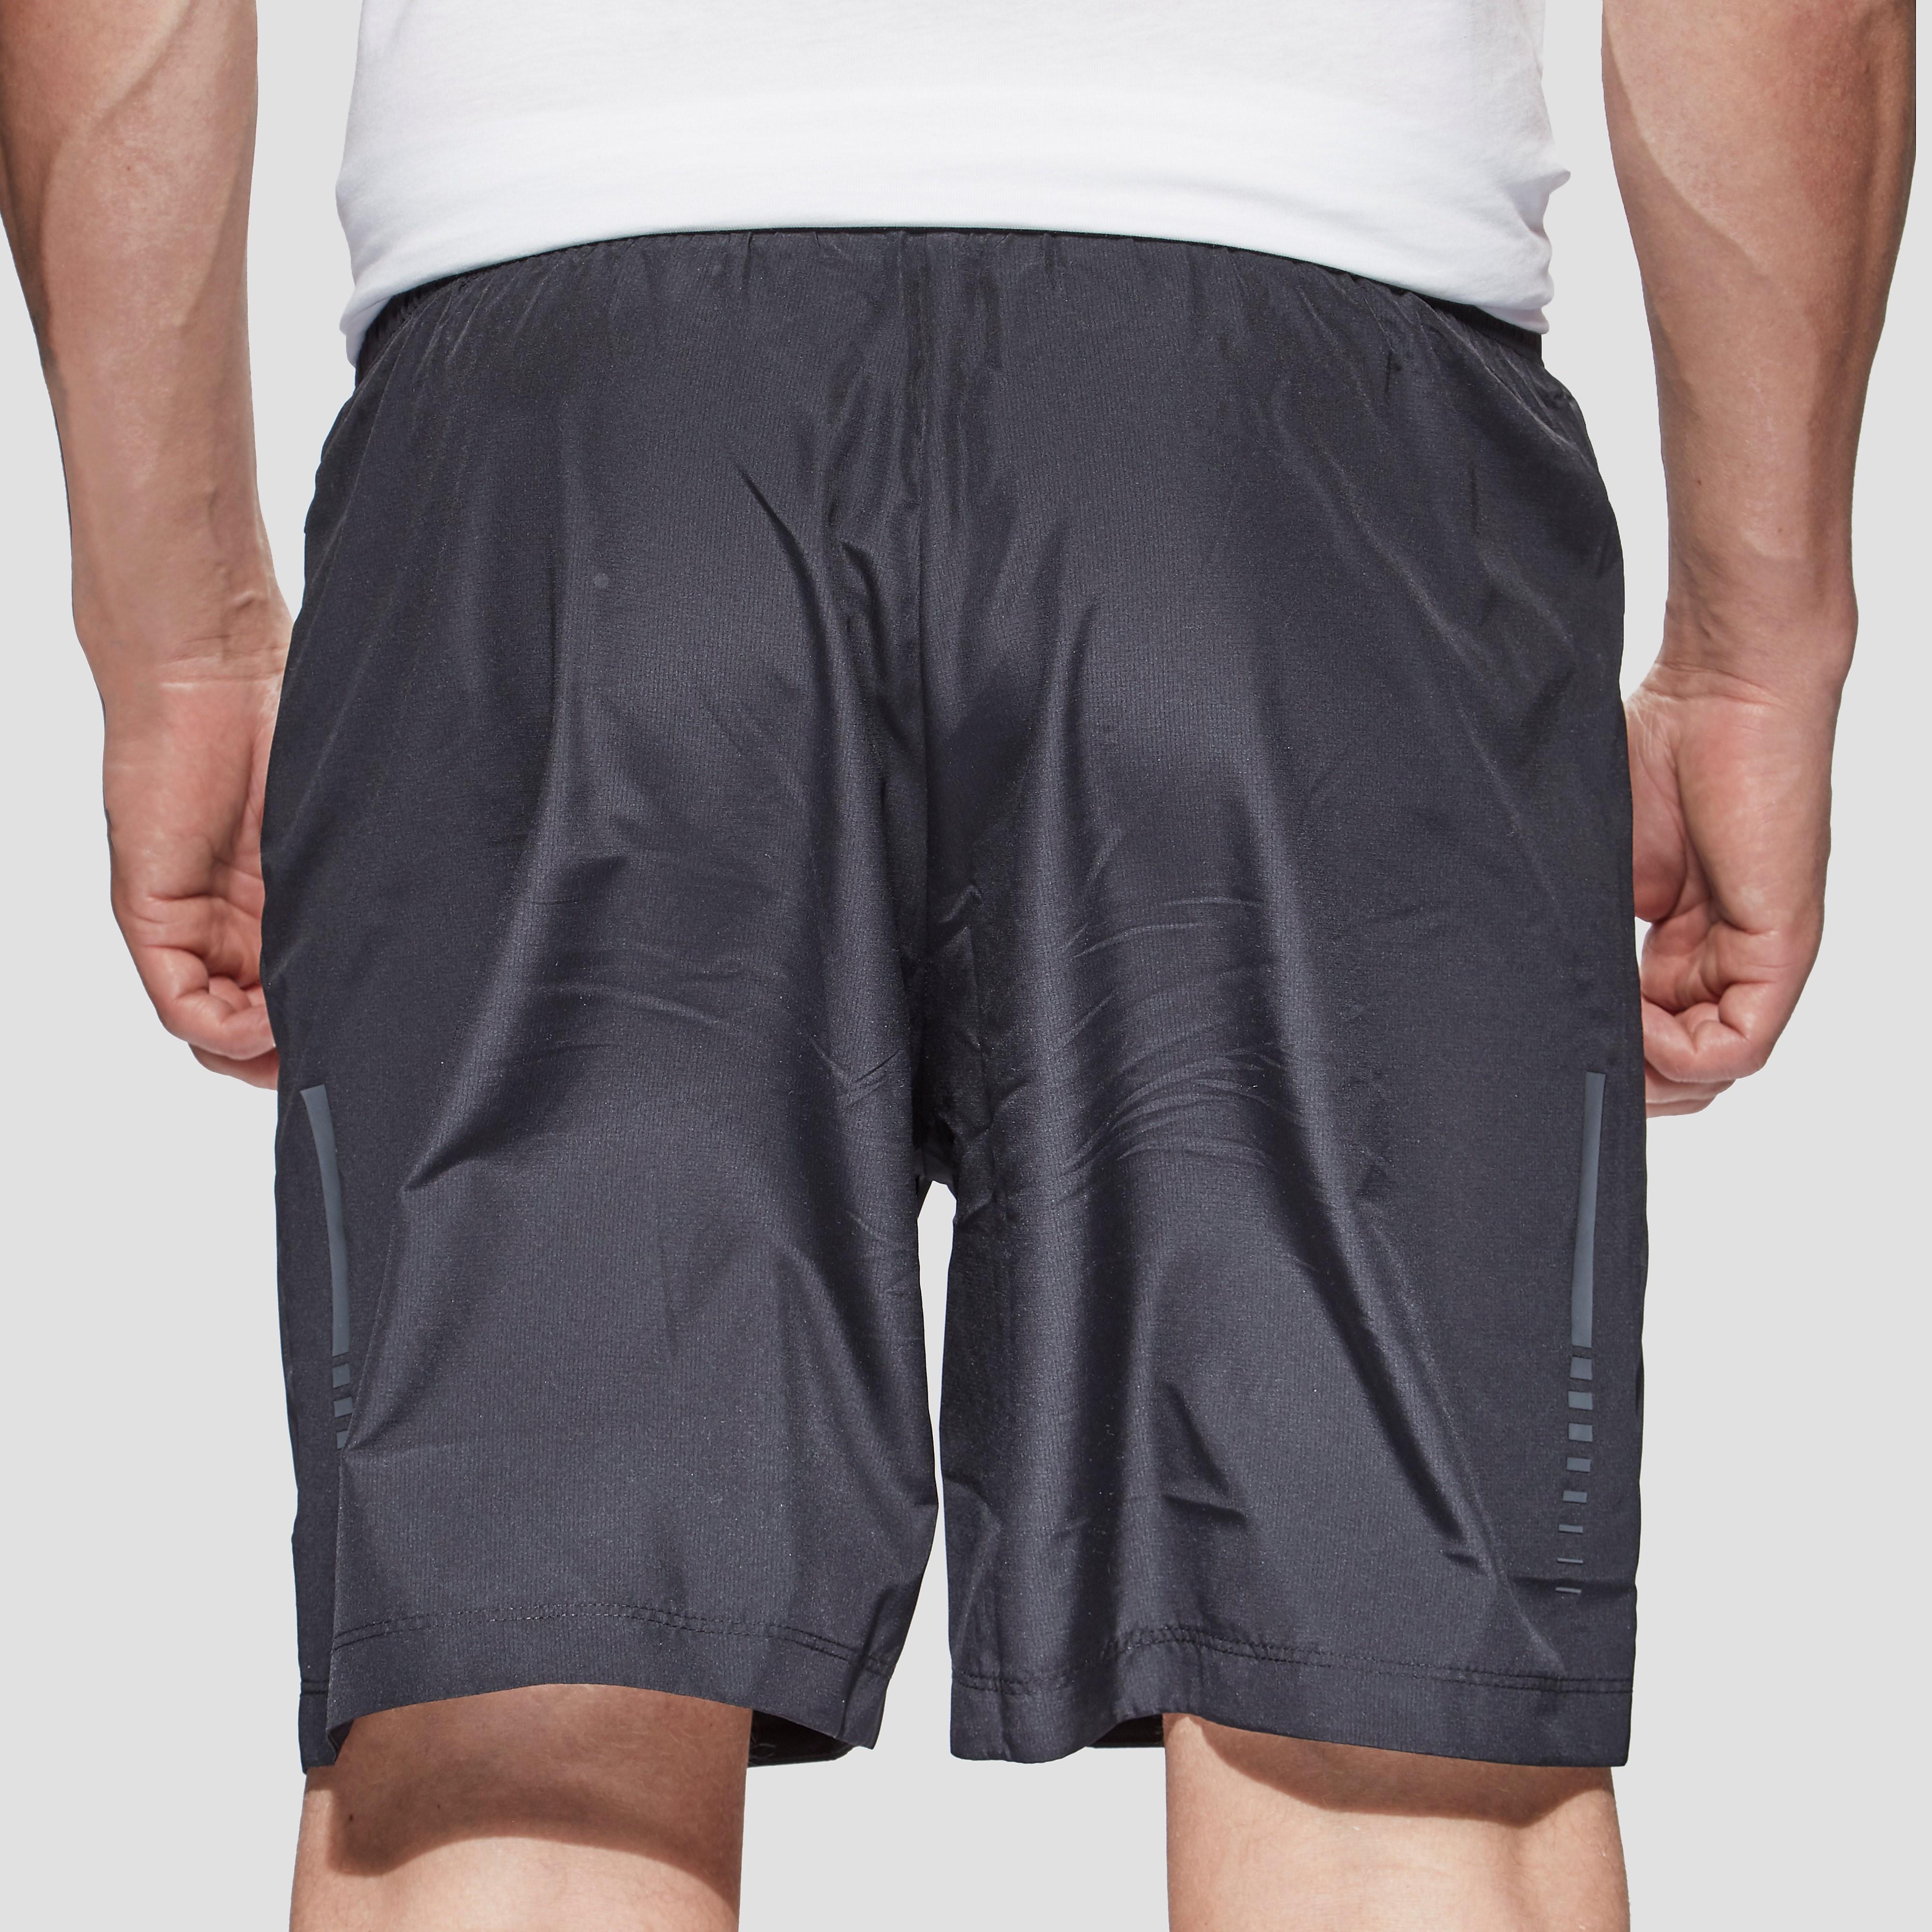 ASICS 7 Inch Men's Running Shorts